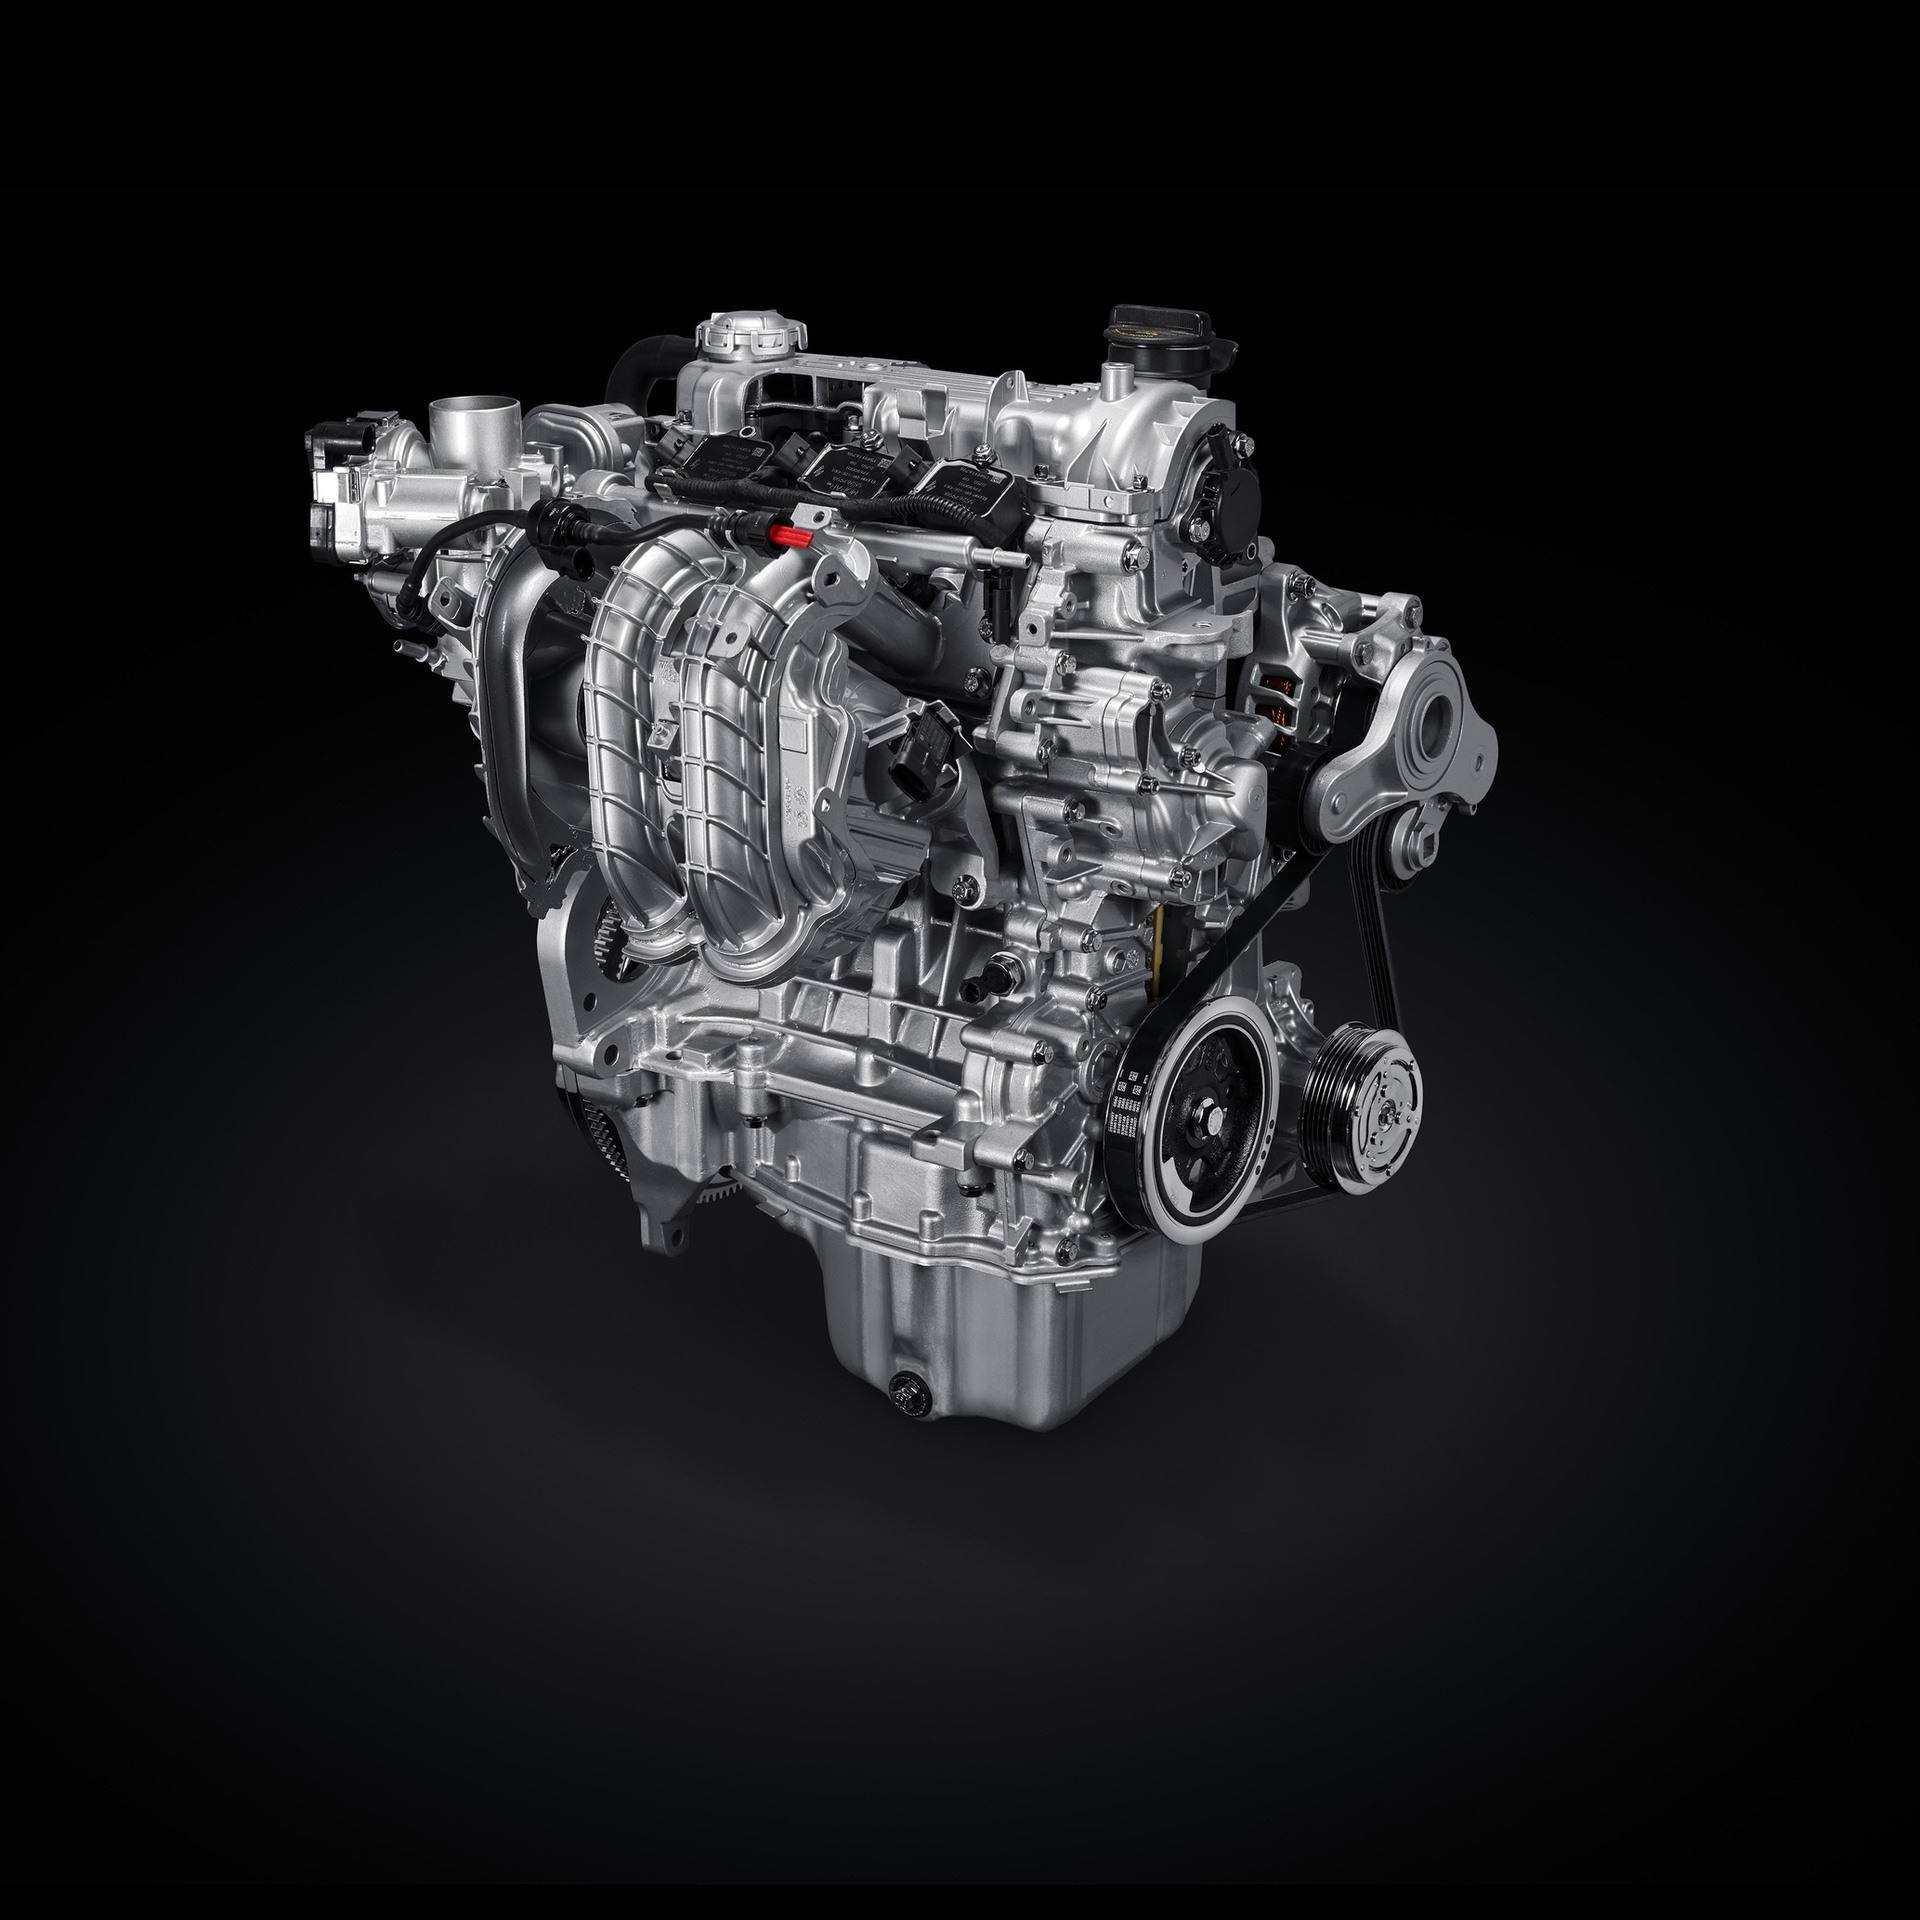 200108_Fiat_Mild-Hybrid-Engine_10